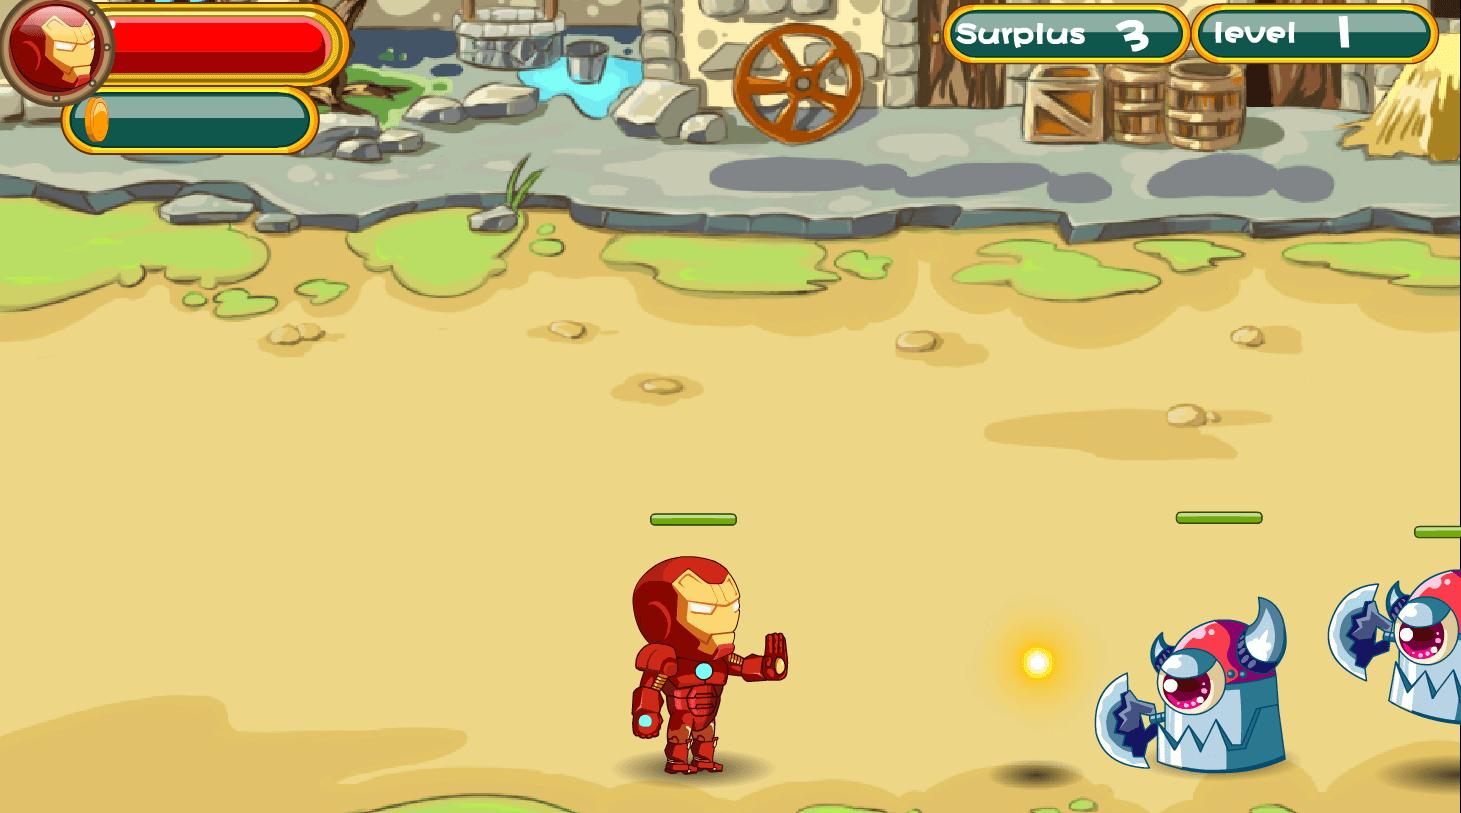 Image Hero Vs Alien Robot